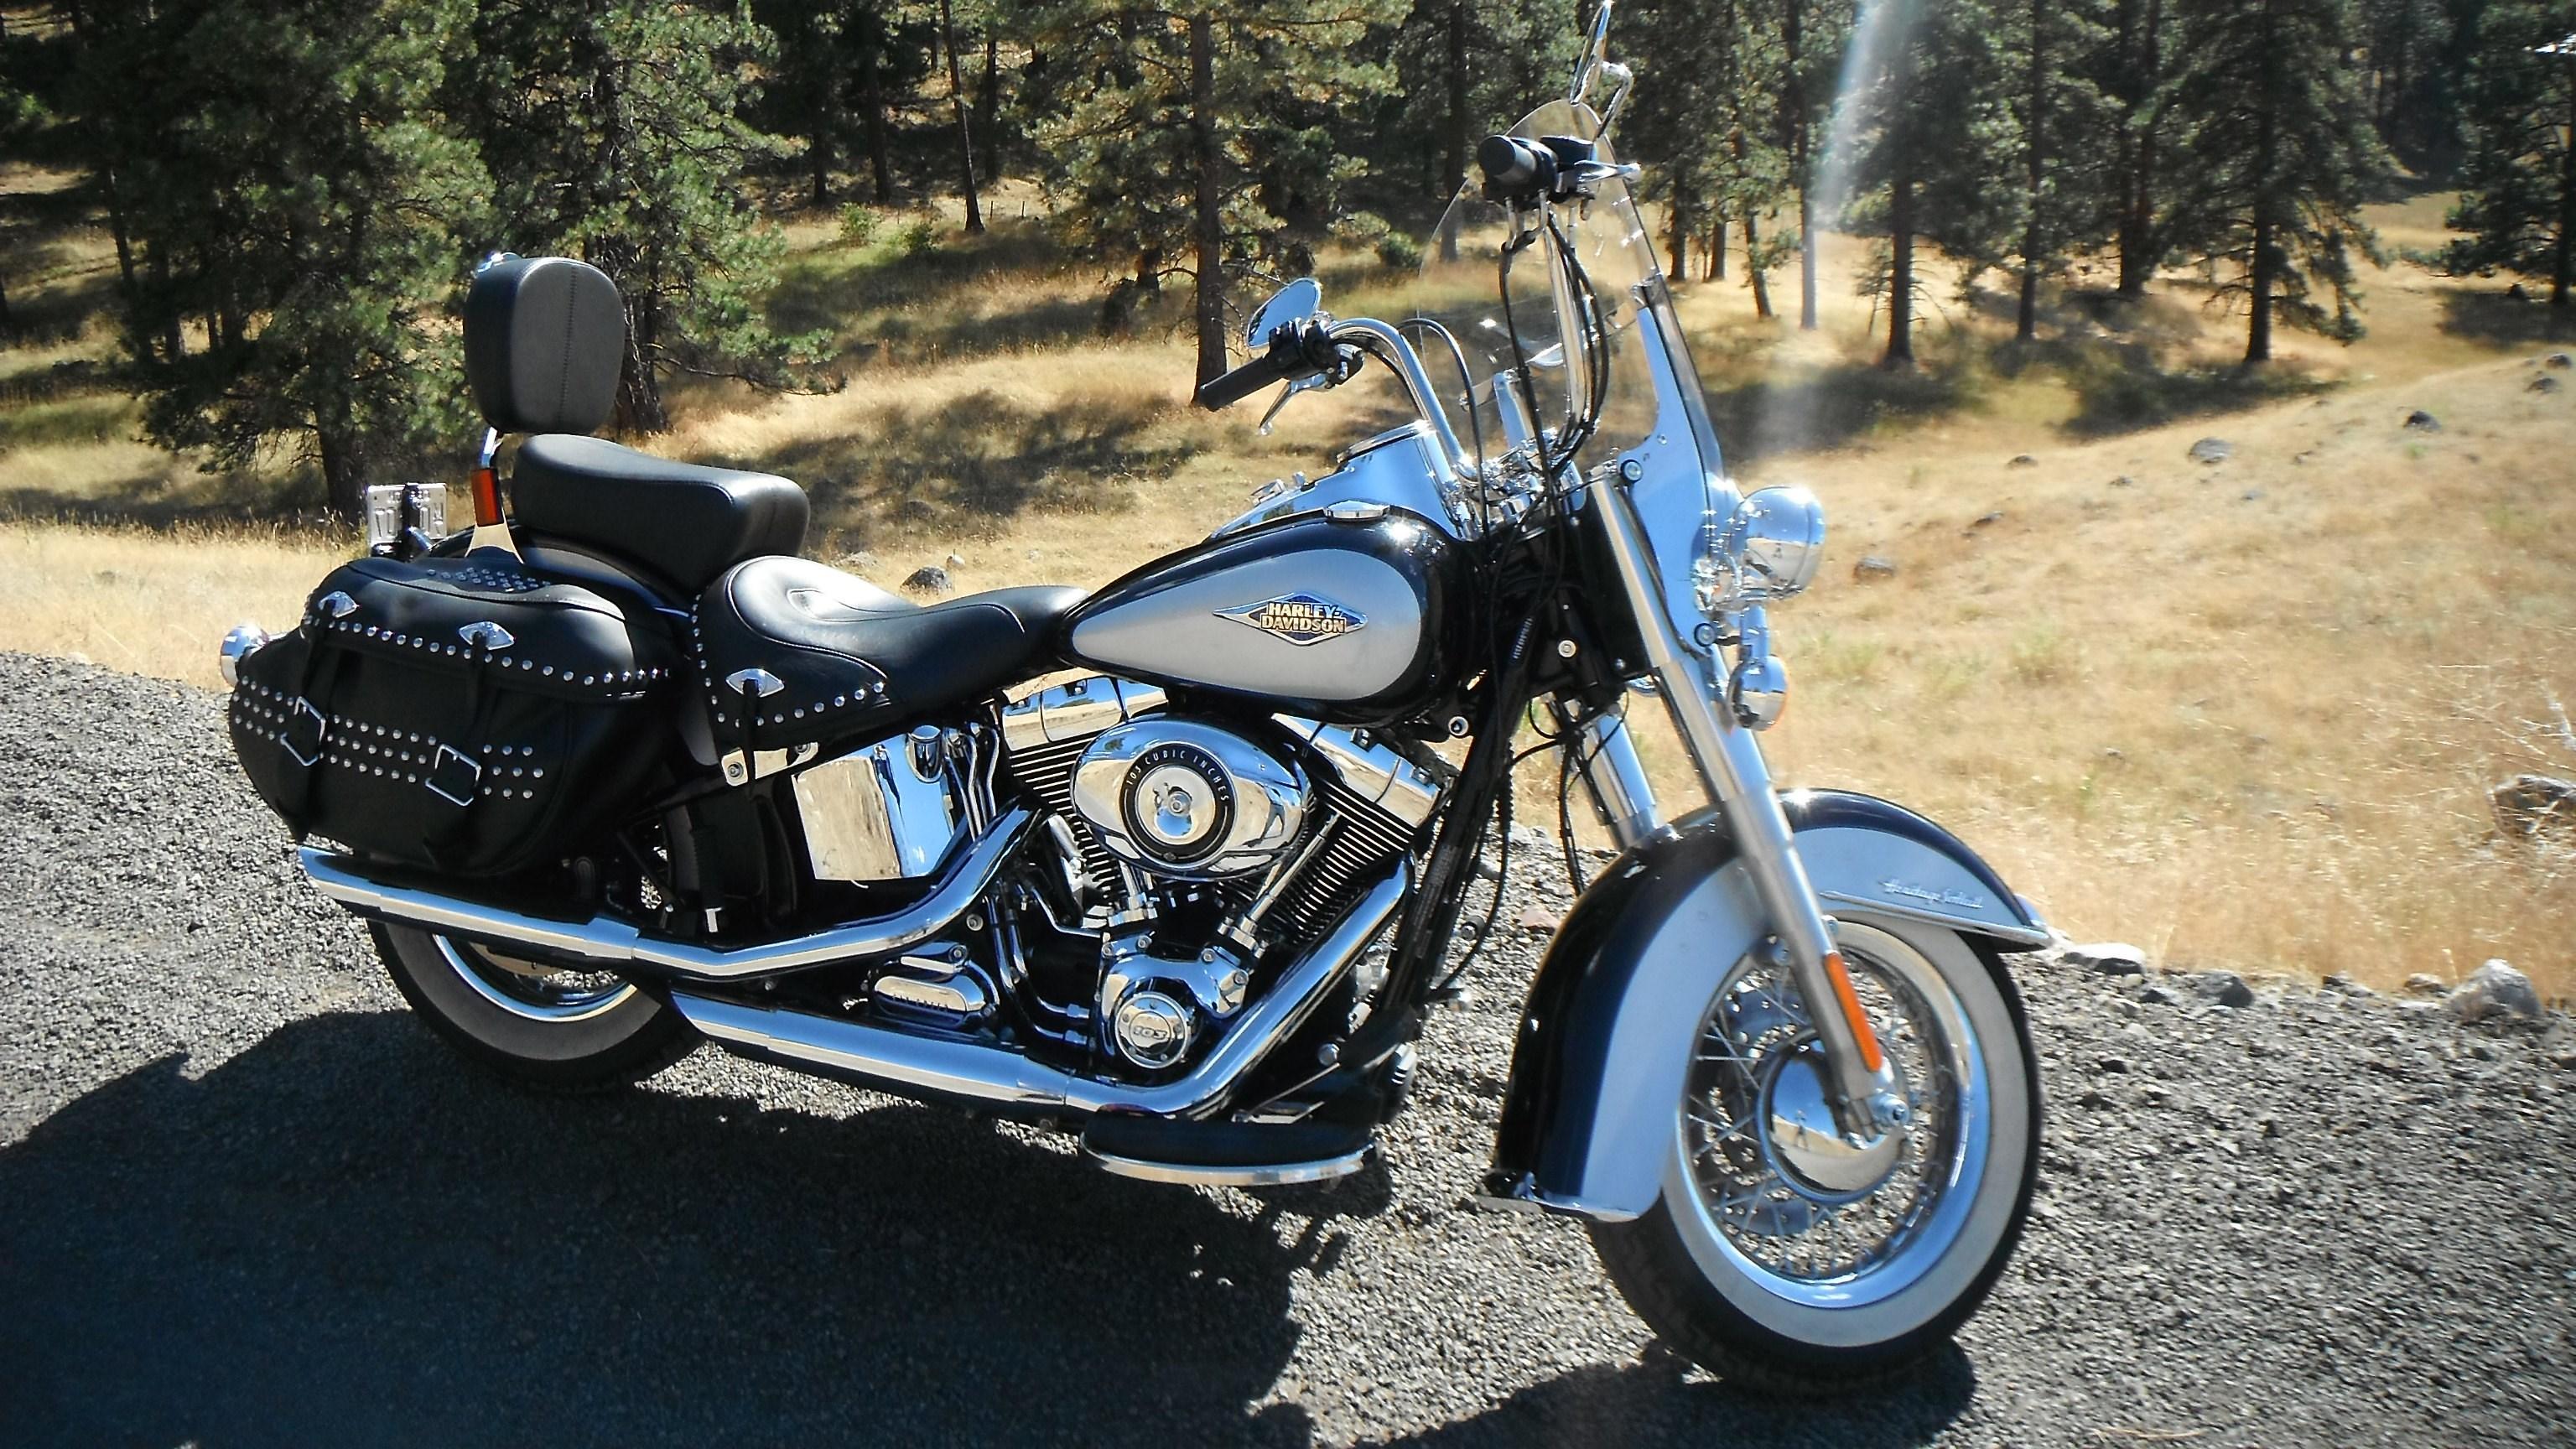 Ford Dealer Evansville Wi >> 2013 Harley-Davidson® FLSTC Heritage Softail® Classic (vivid black, hot pearl white/blue tank ...